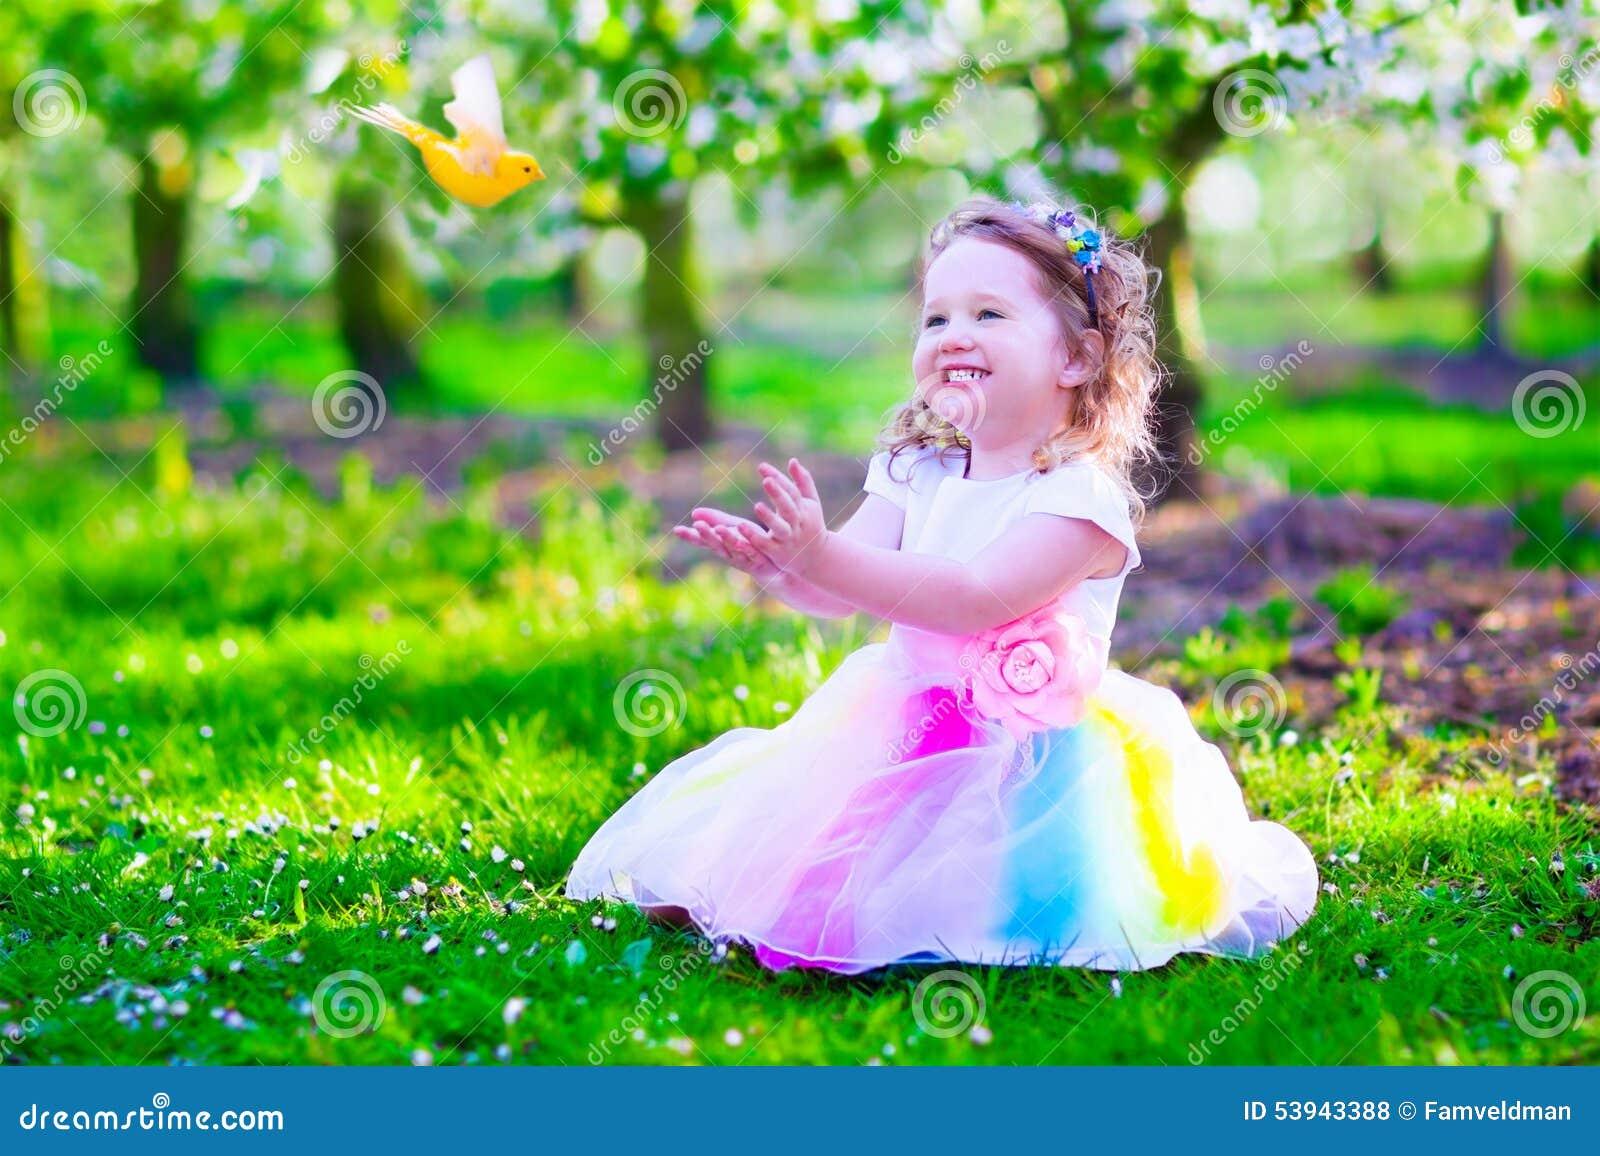 Great Beautiful Little Girl In Fairy Costume Feeding A Bird